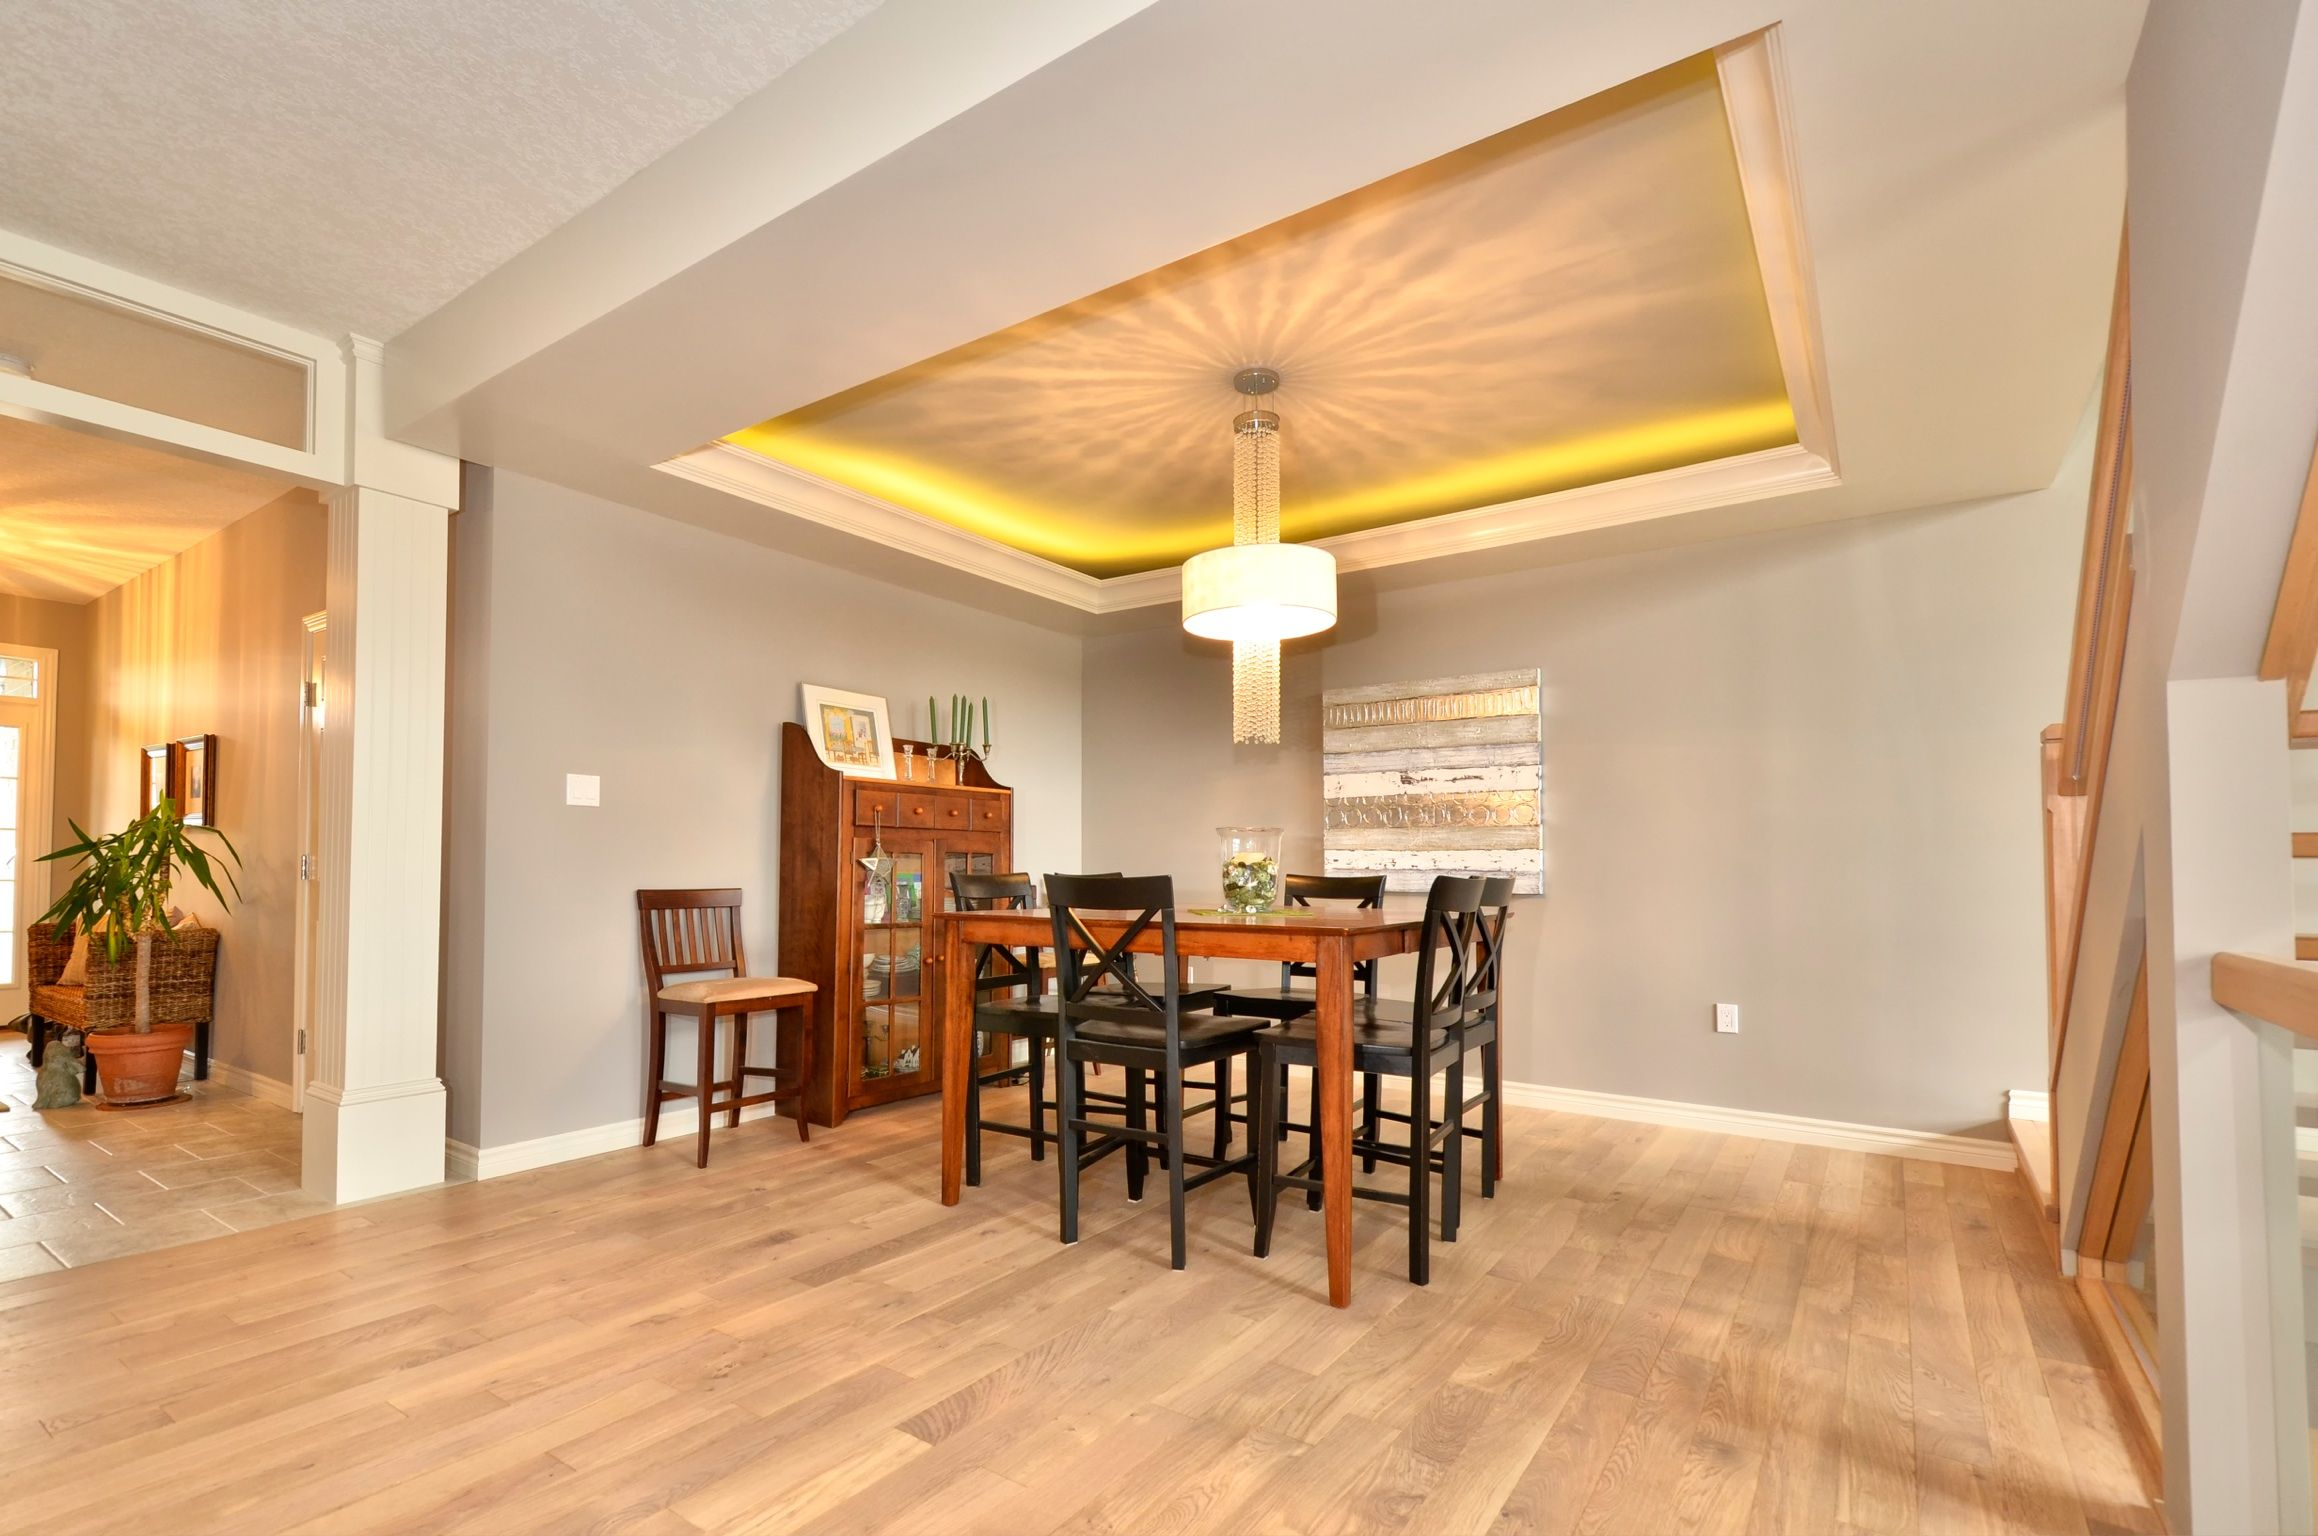 cove ceiling dining room decor ideas pinterest